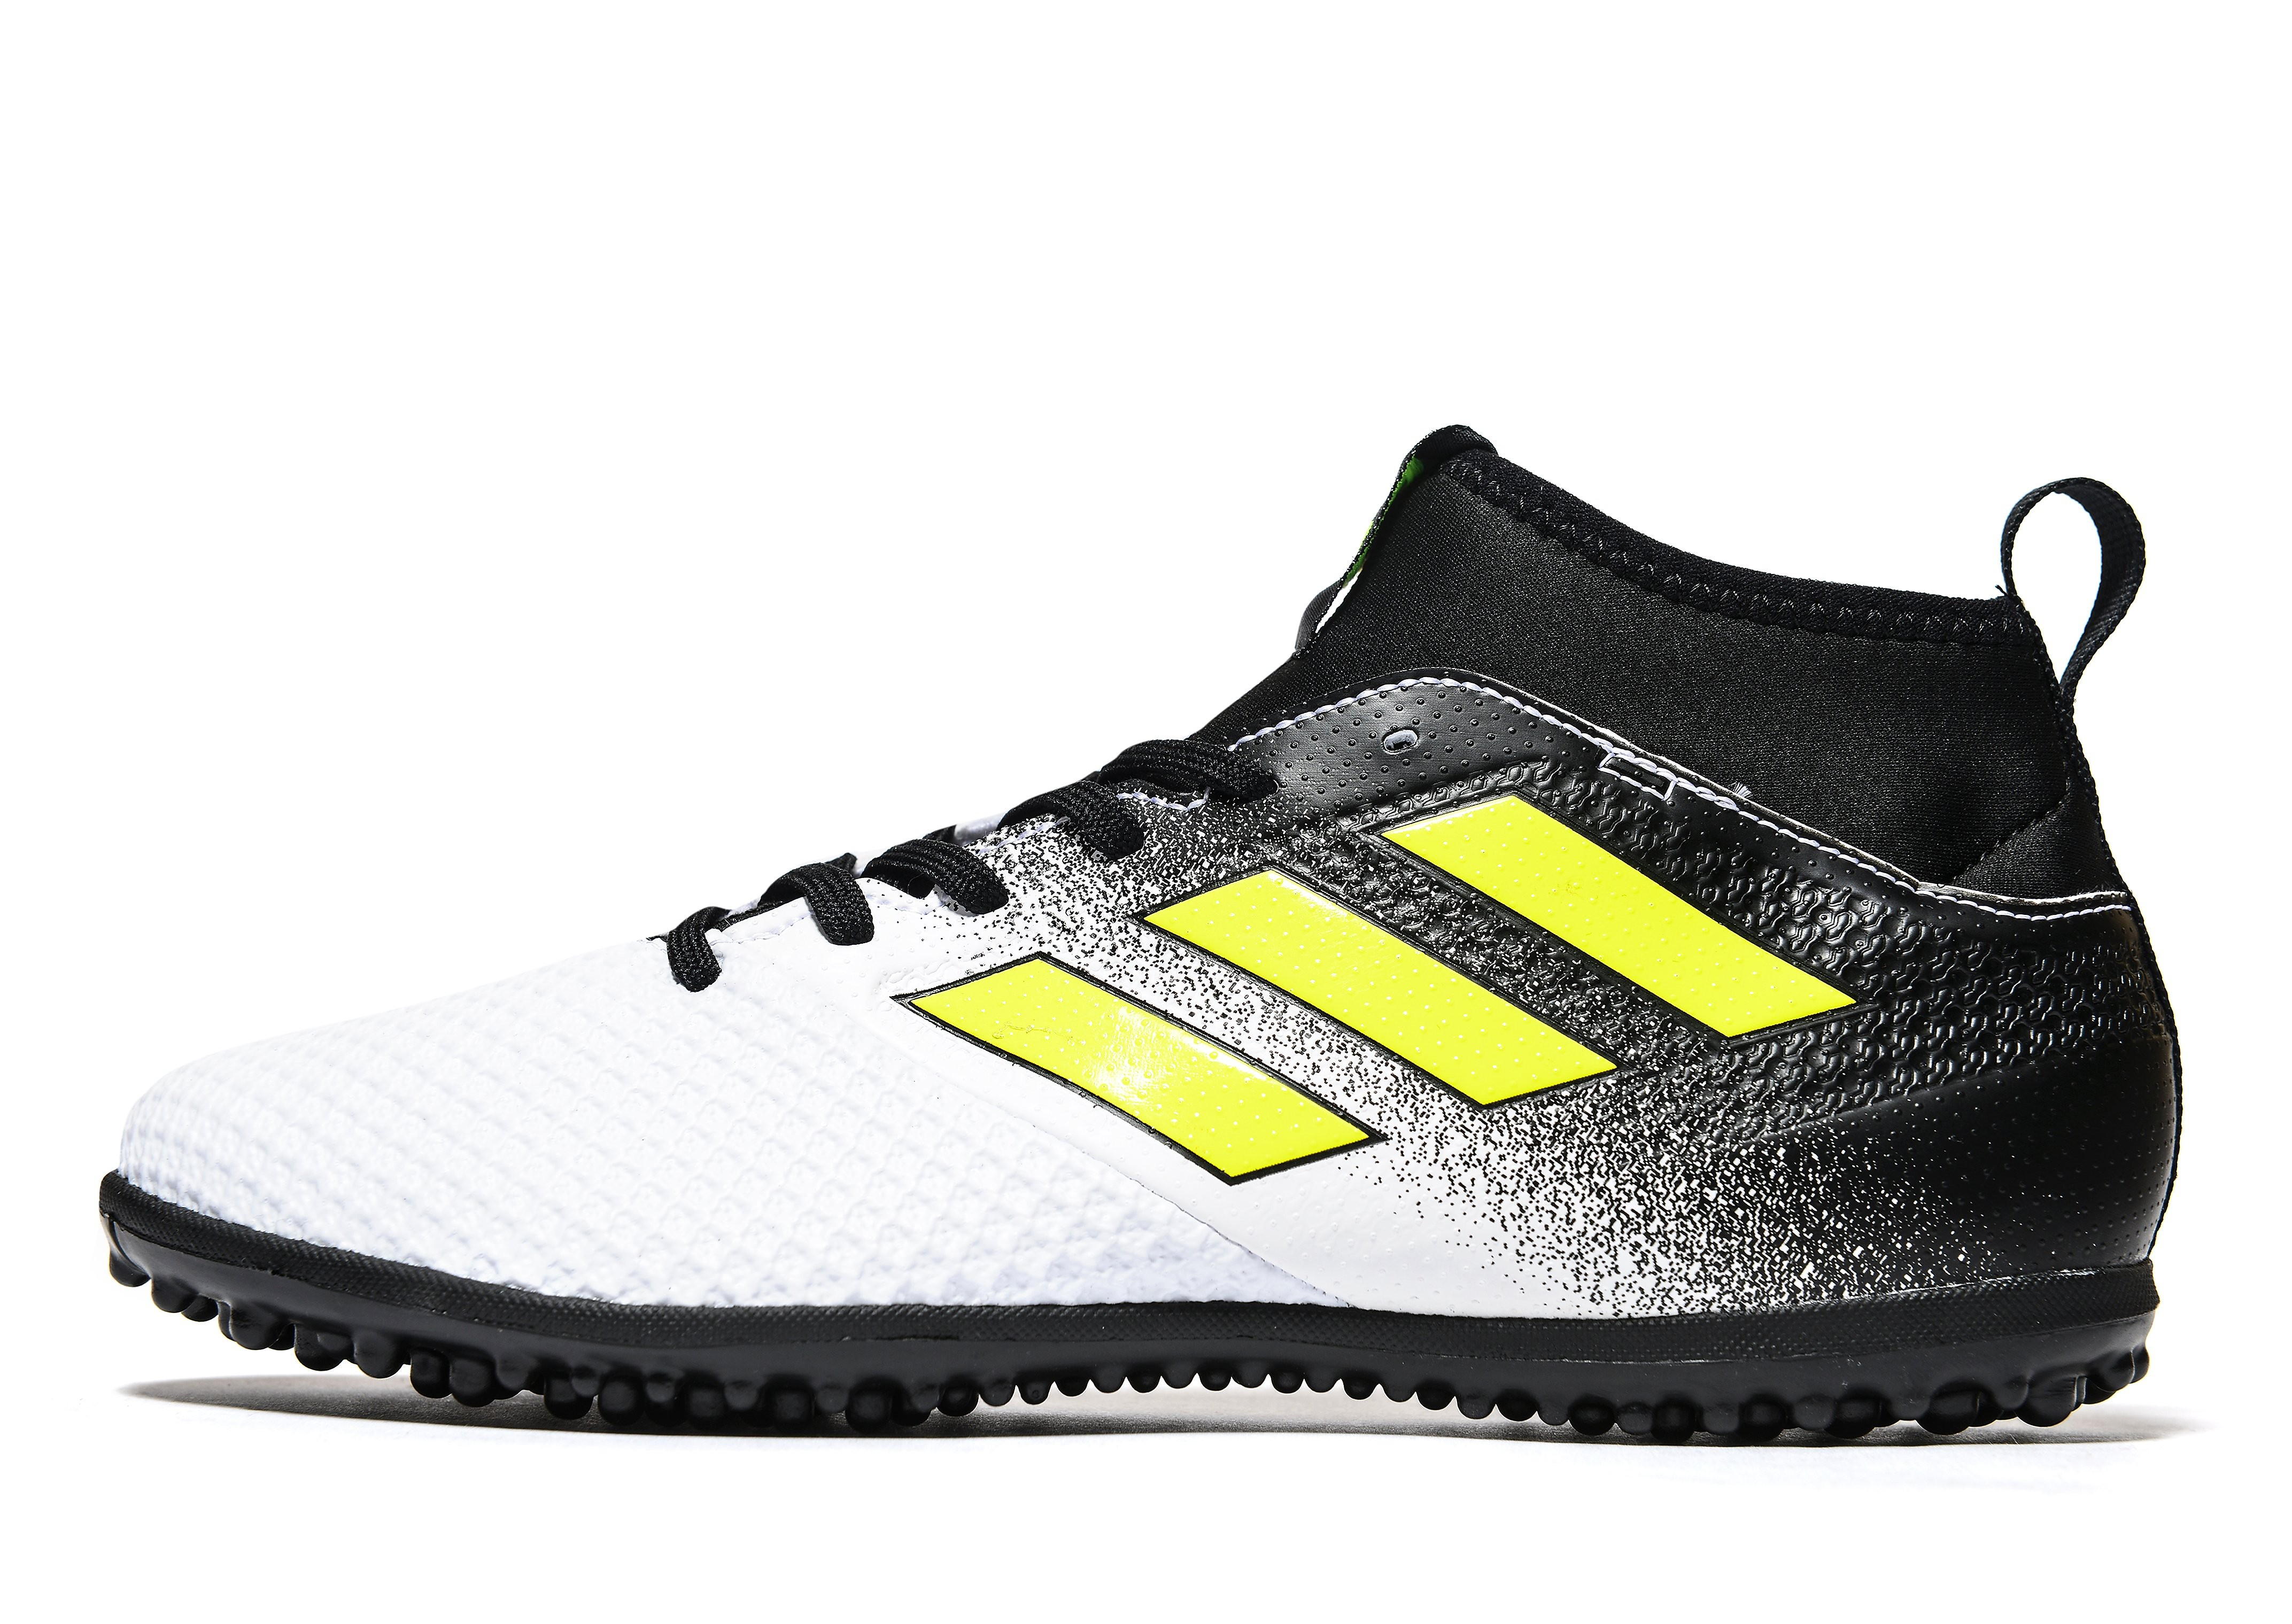 adidas Dust Storm ACE 17.3 Primemesh Turf